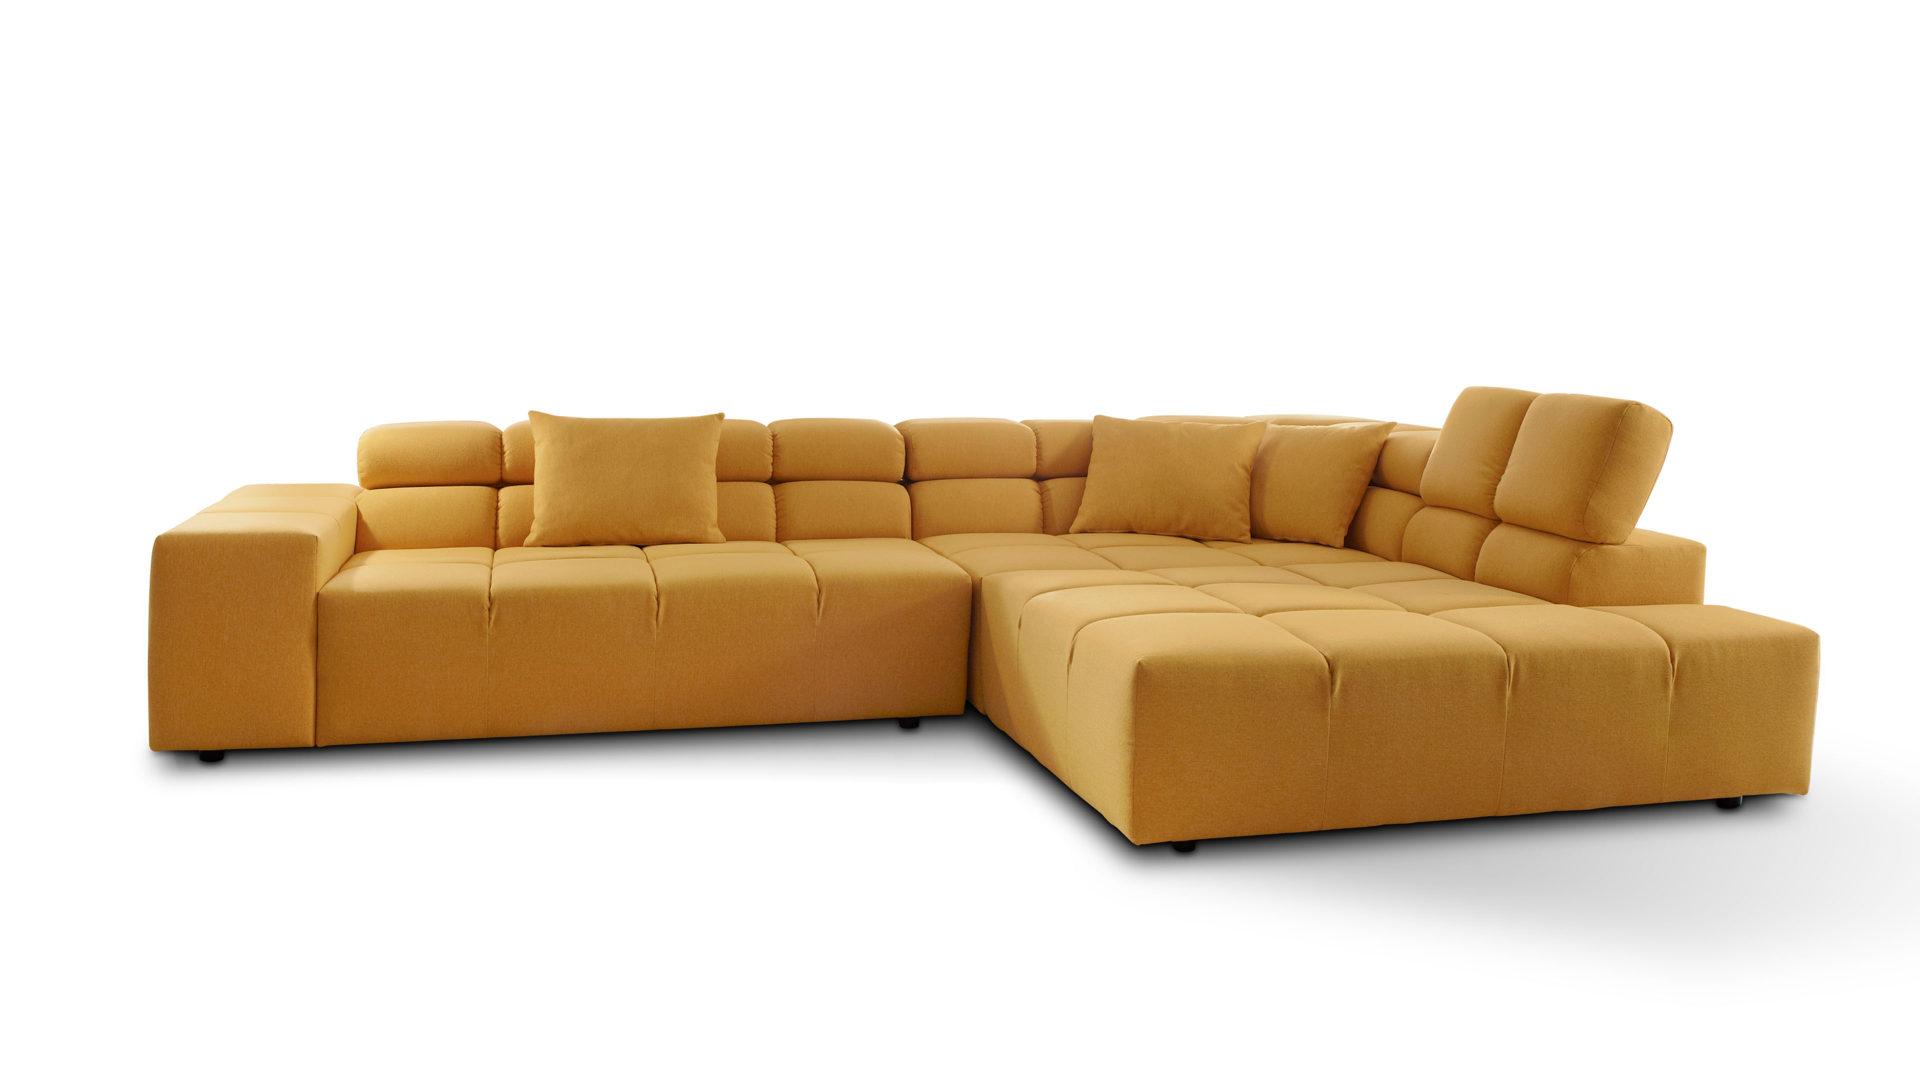 Lounge ecksofa  Möbel Frauendorfer Amberg | Markenshops | Couches + Sofas ...